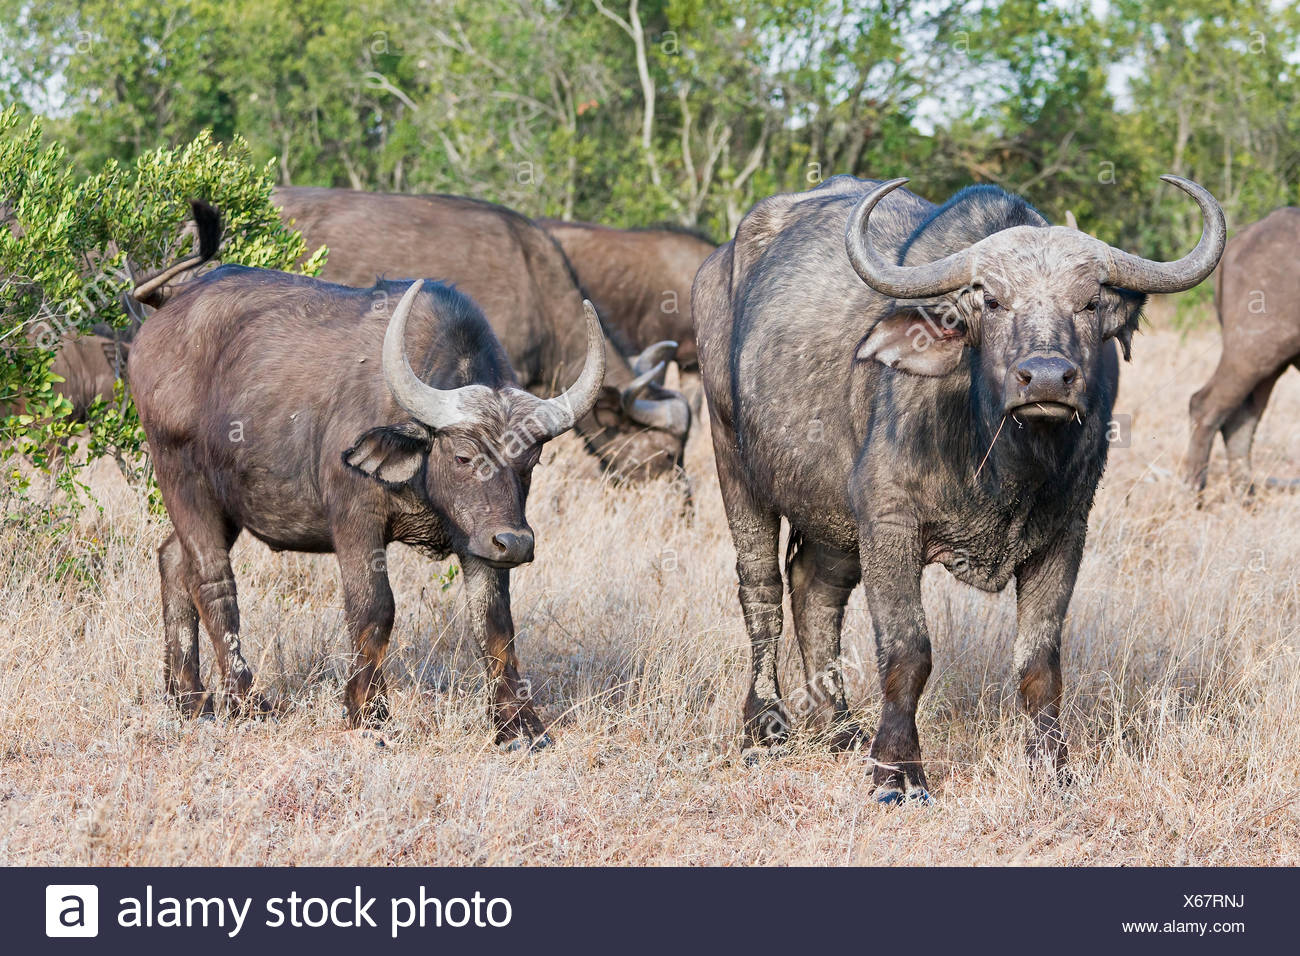 Cape buffalos (Syncerus caffer), Ol Pejeta Reserve, Kenya - Stock Image